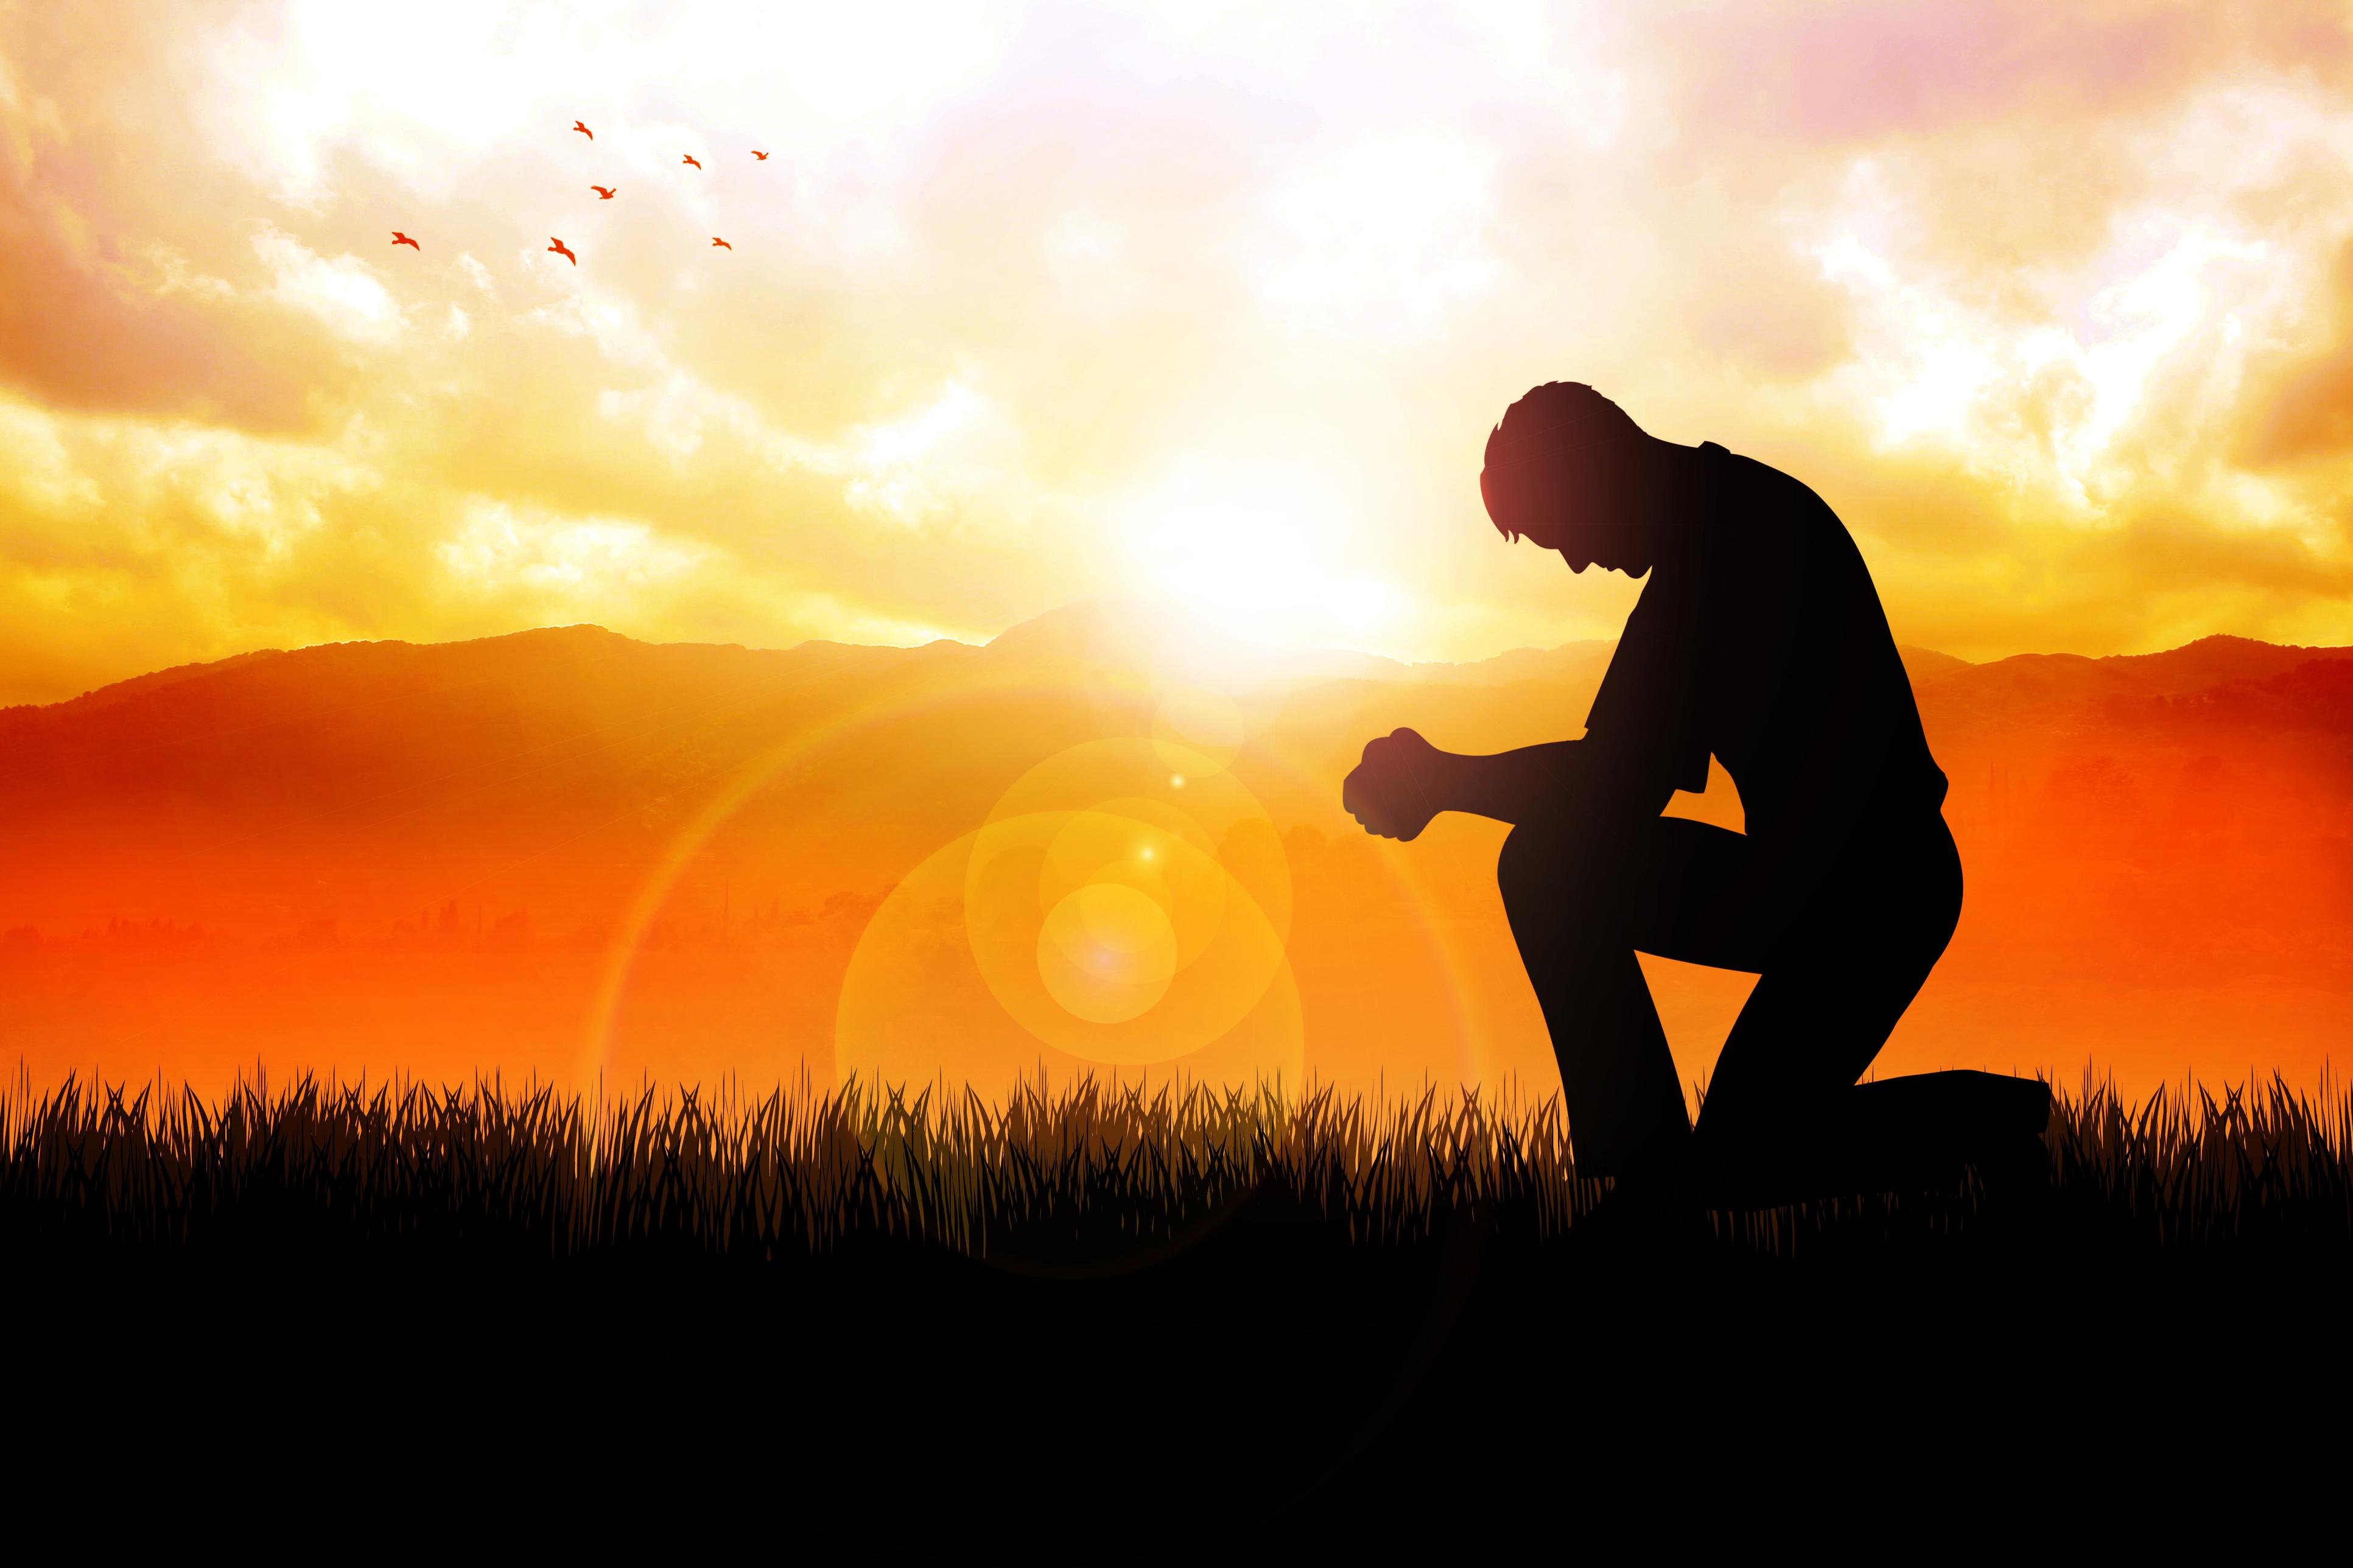 Livro: O Espírito Santo – O Deus-Pai3 min read